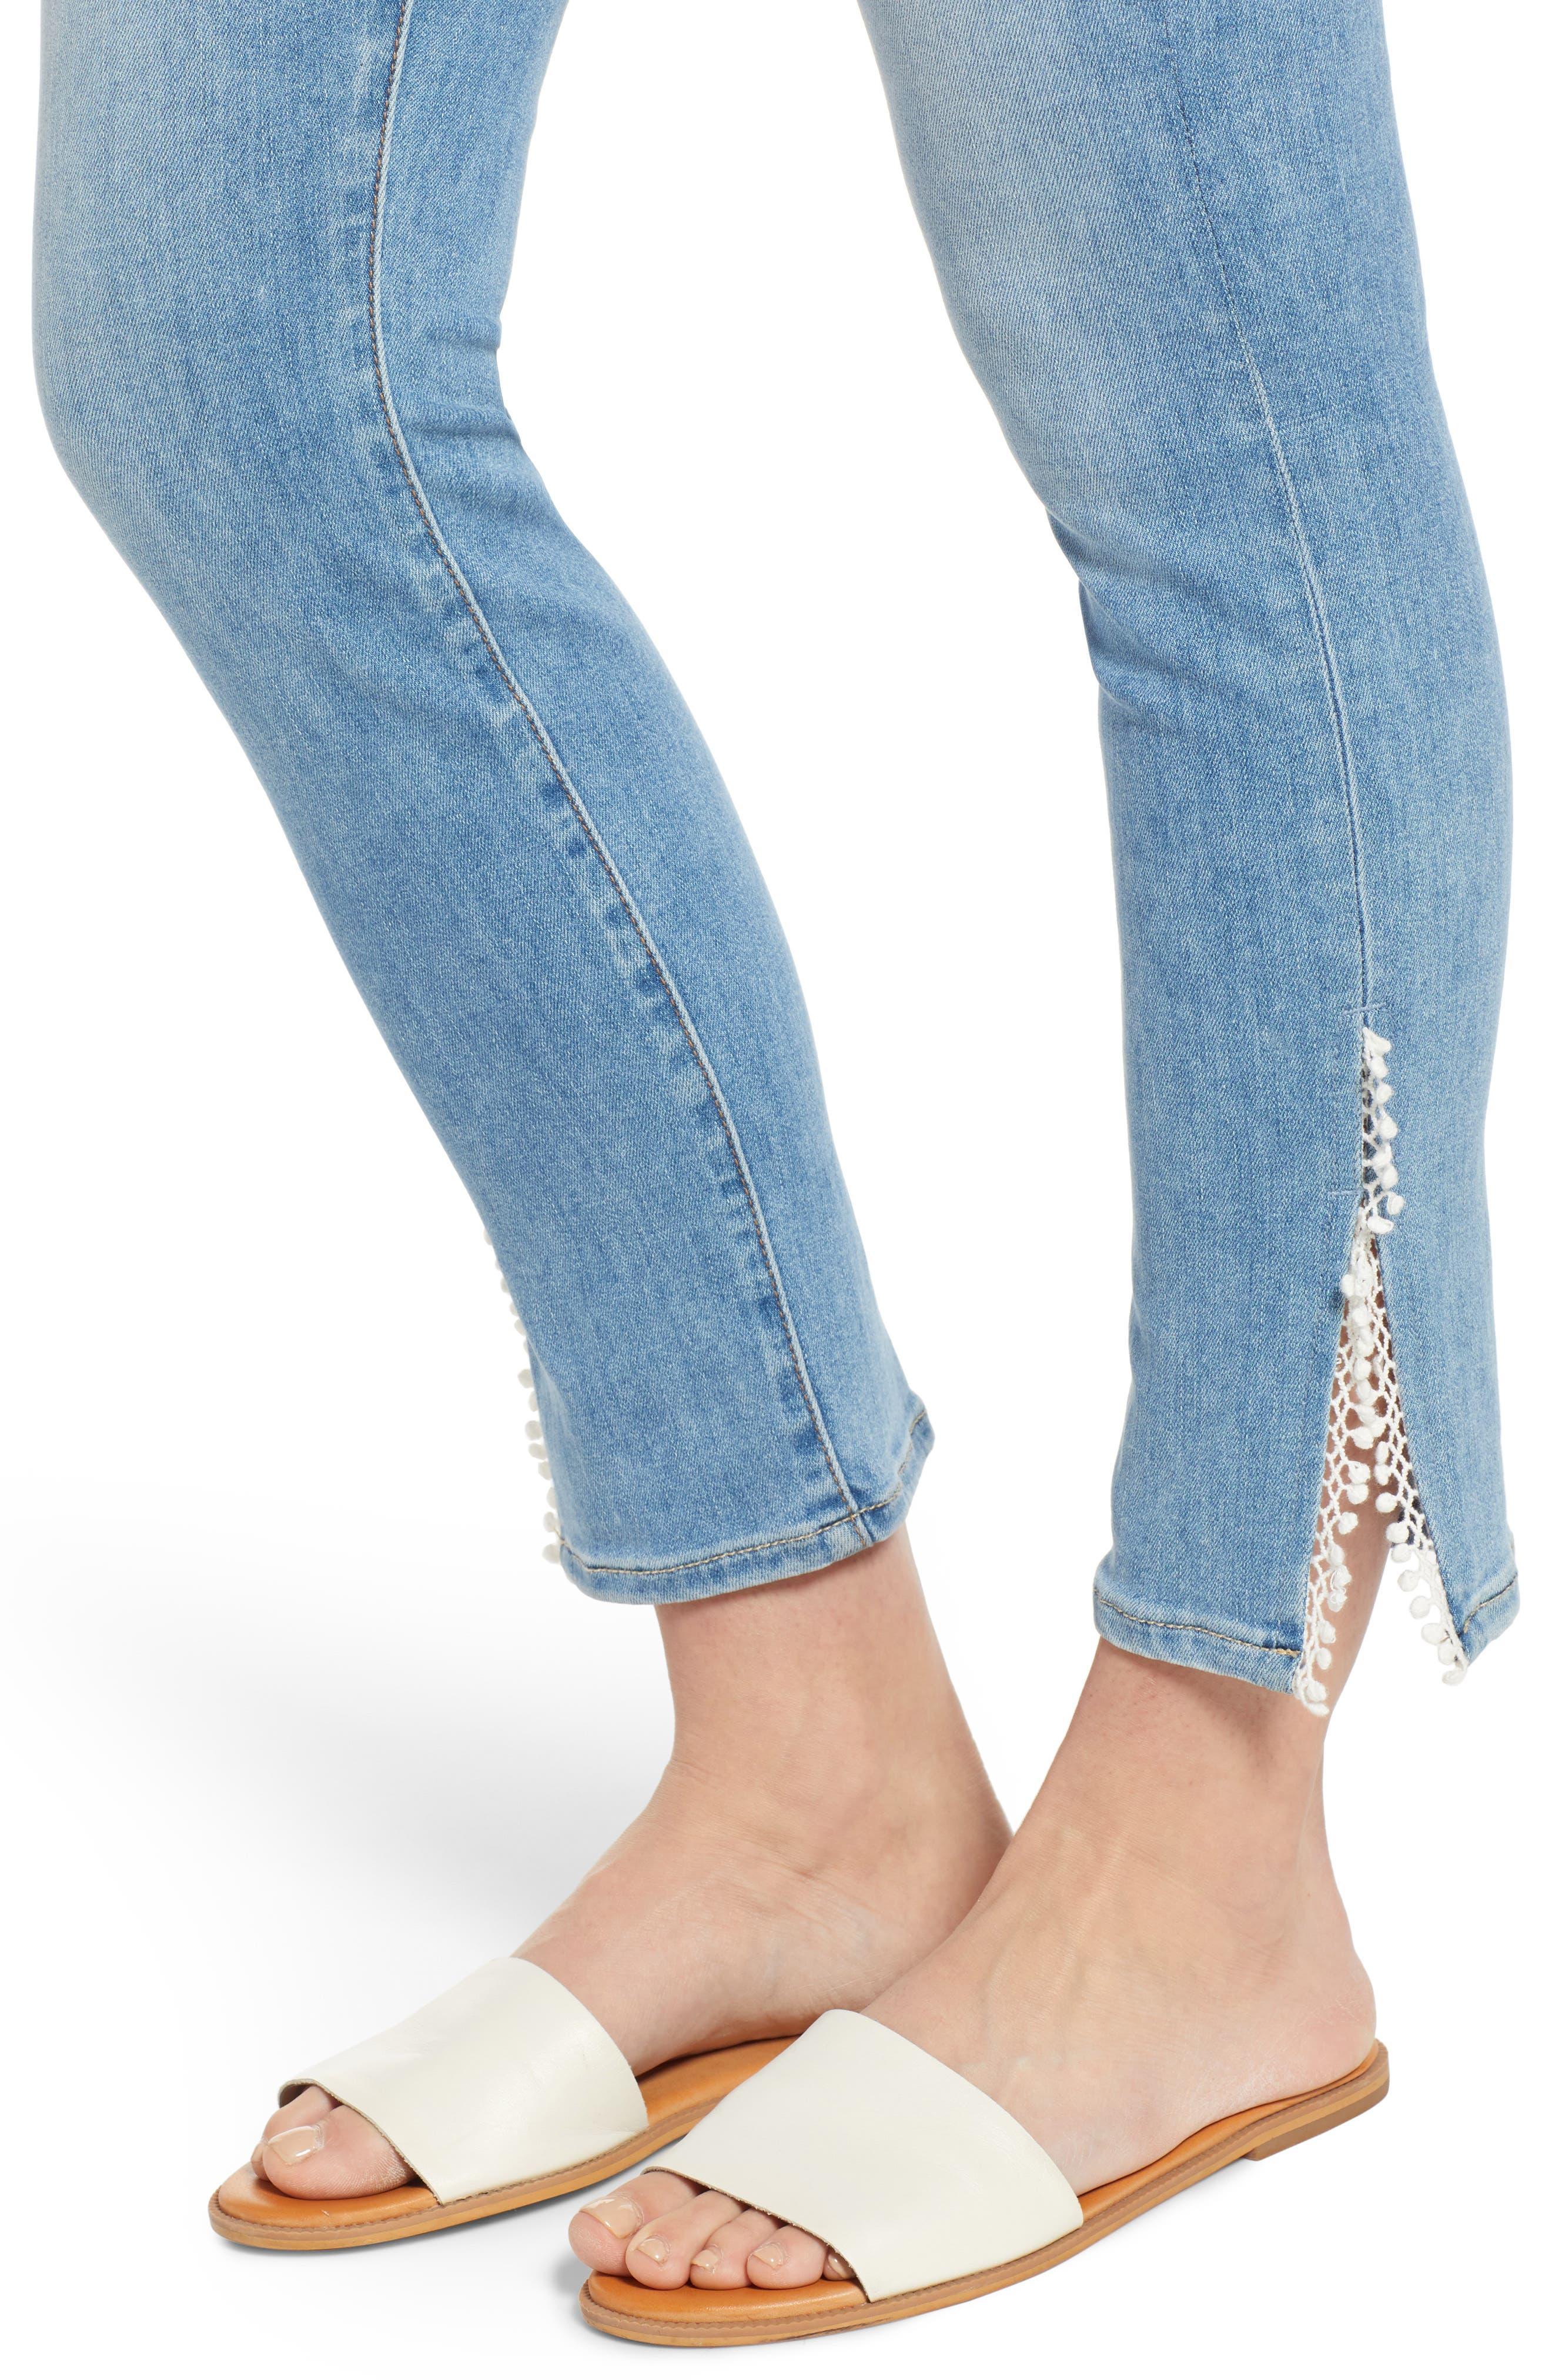 JEN7 BY 7 FOR ALL MANKIND, Pompom Detail Crop Skinny Jeans, Alternate thumbnail 4, color, LA QUINTA POM POM